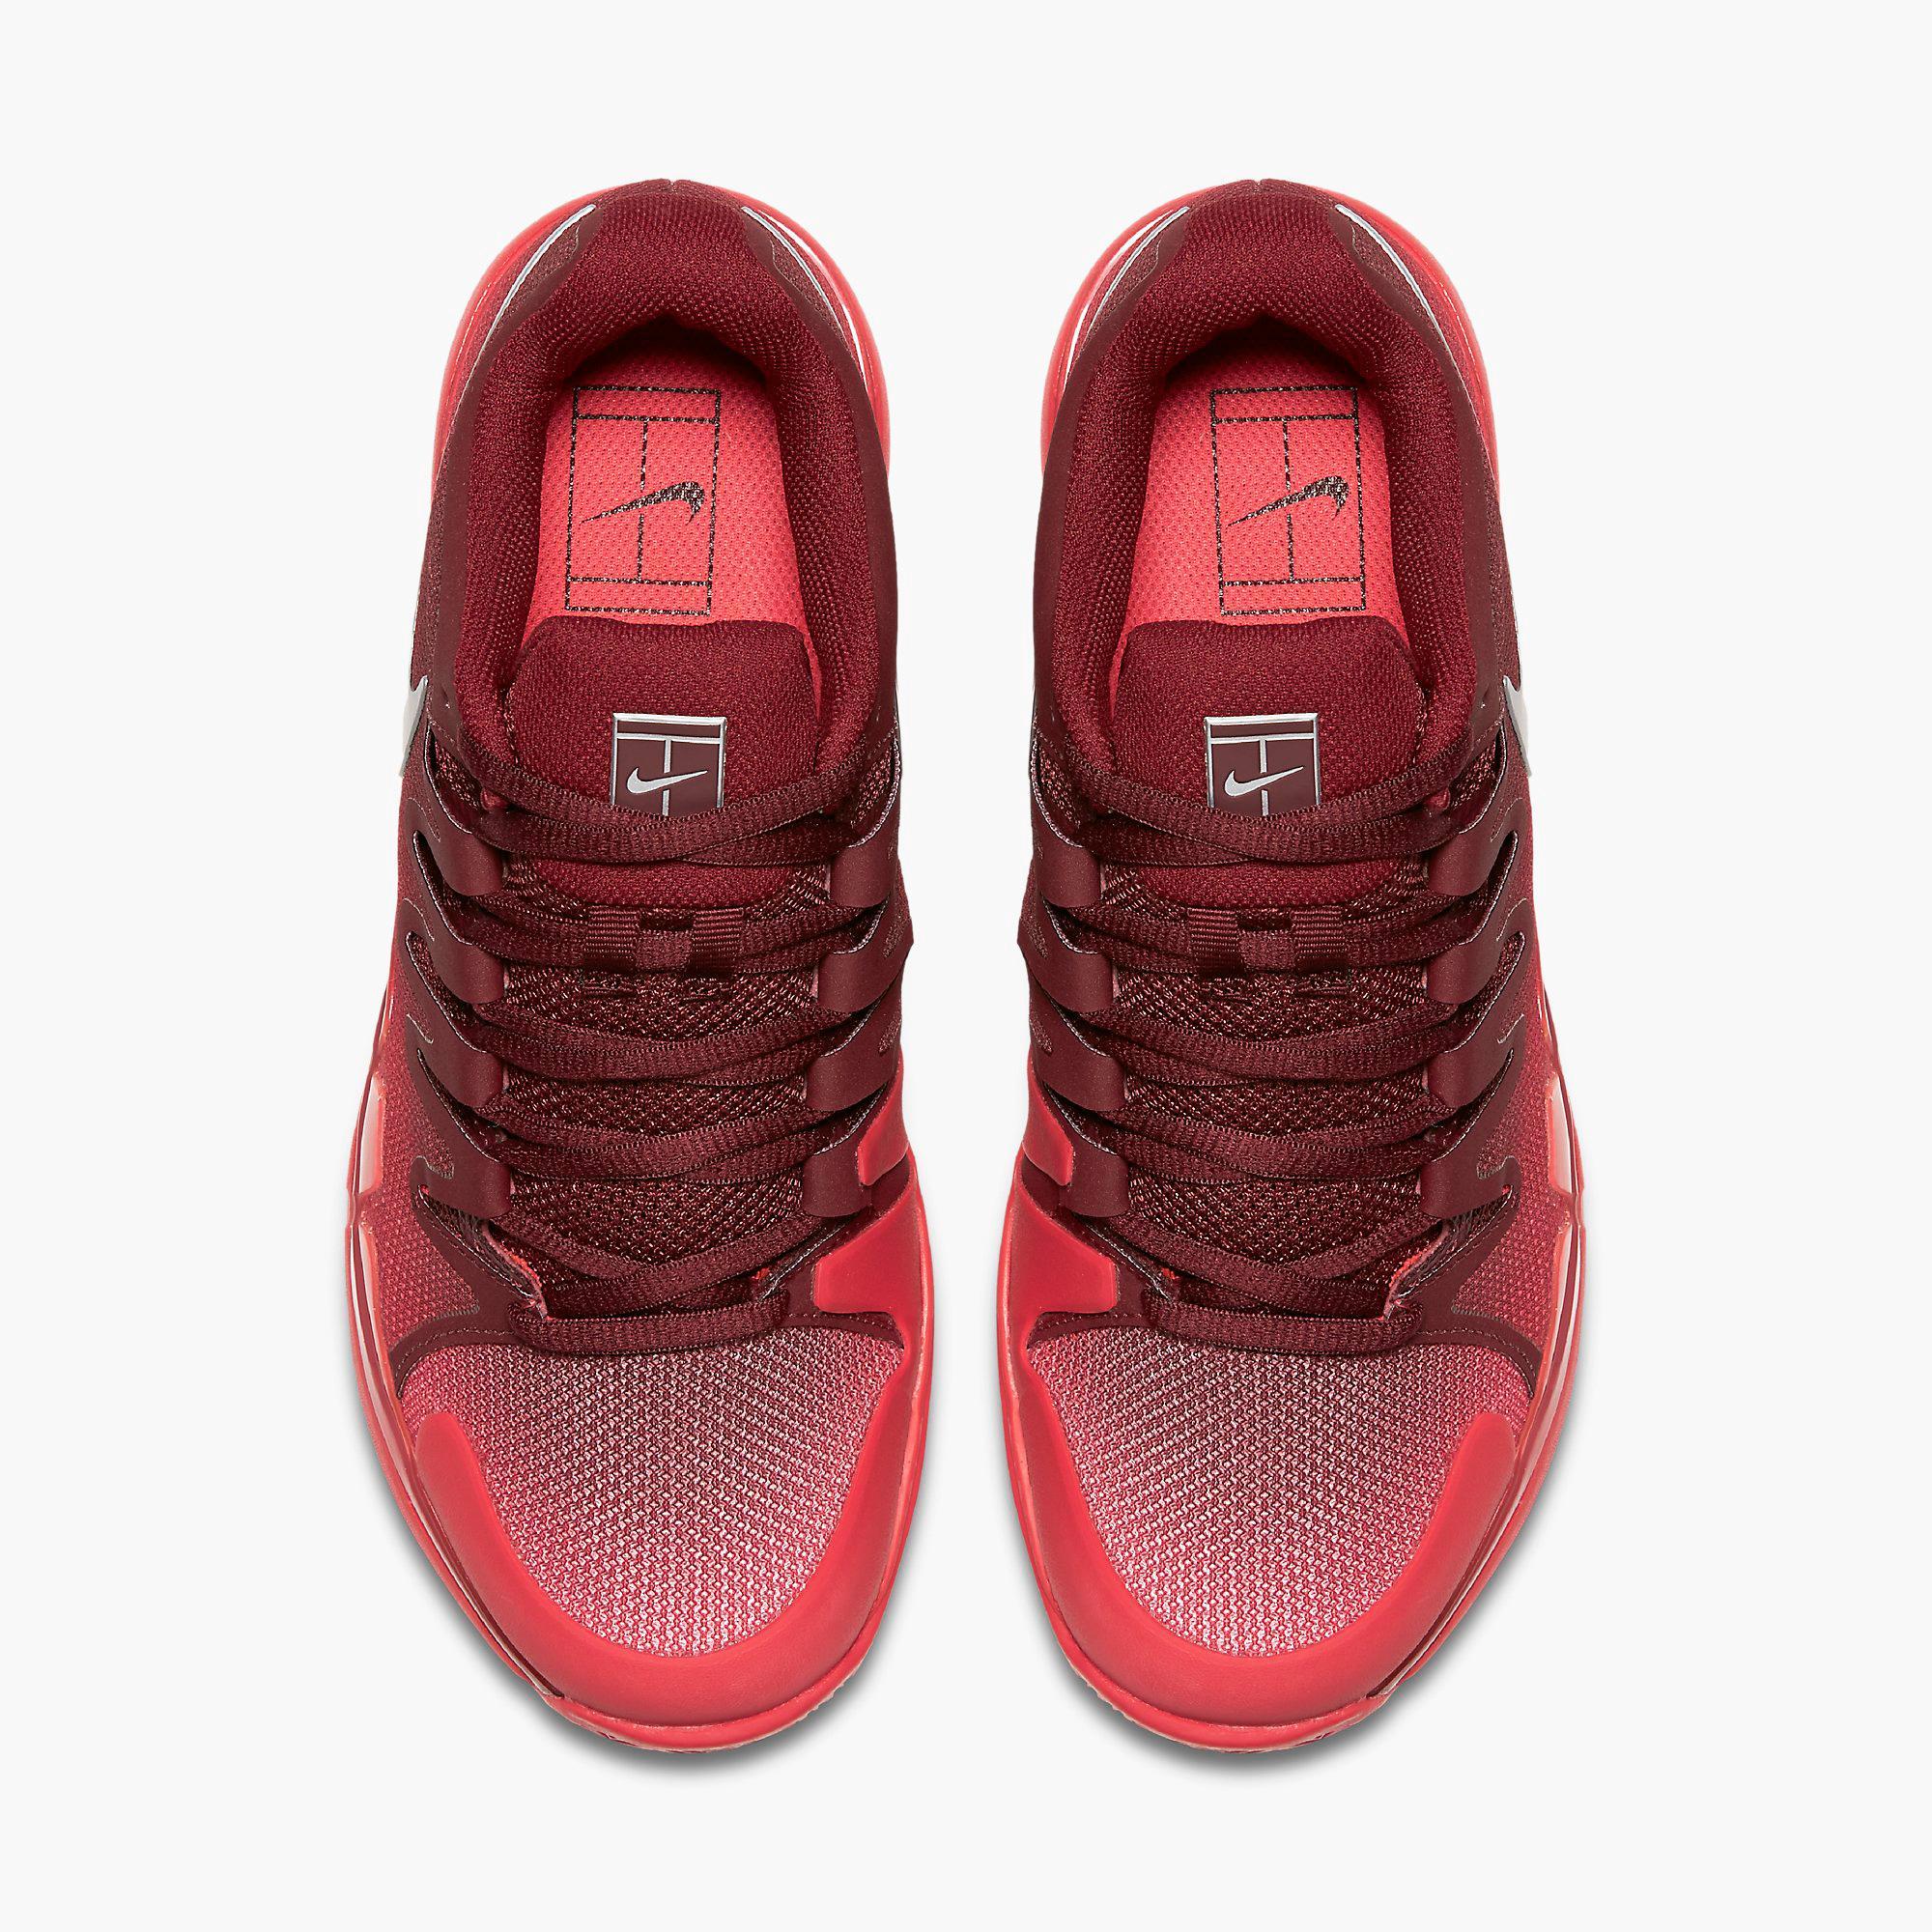 69b3fb4cc24d Nike Womens Zoom Vapor 9.5 Tennis Shoes - Team Red Siren Red ...